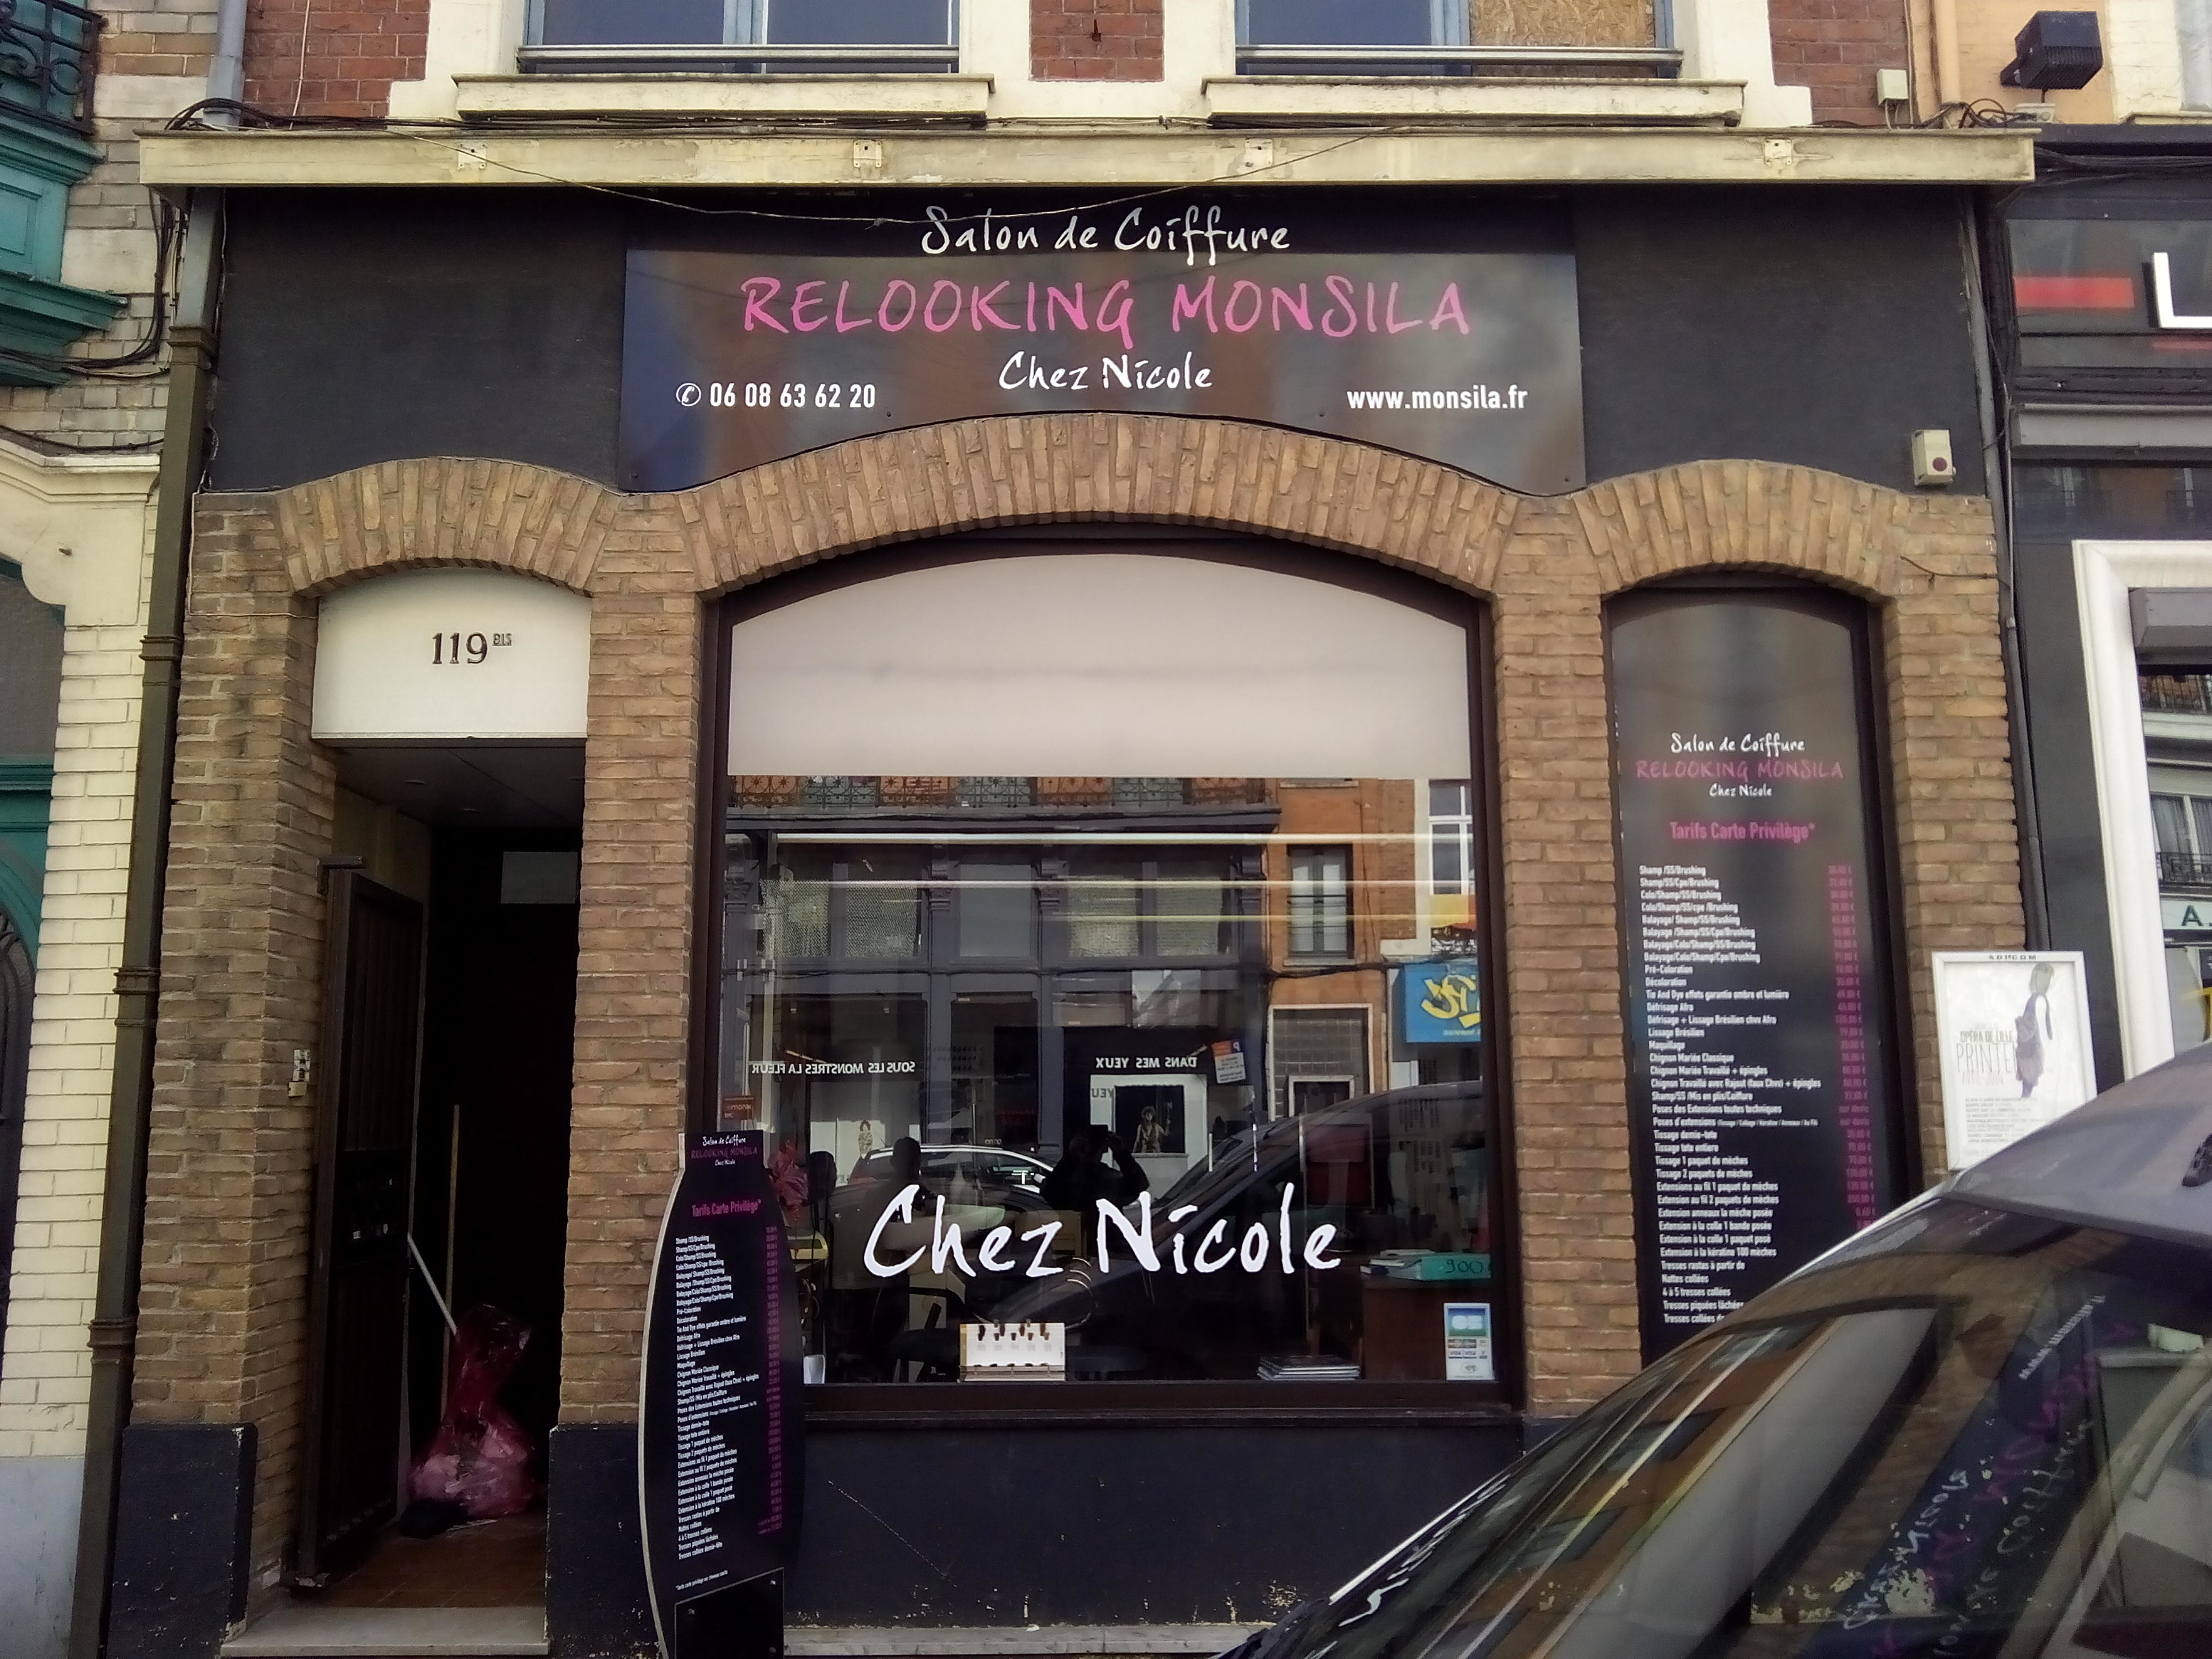 Salon de Coiffure Relooking  - Chez Nicole